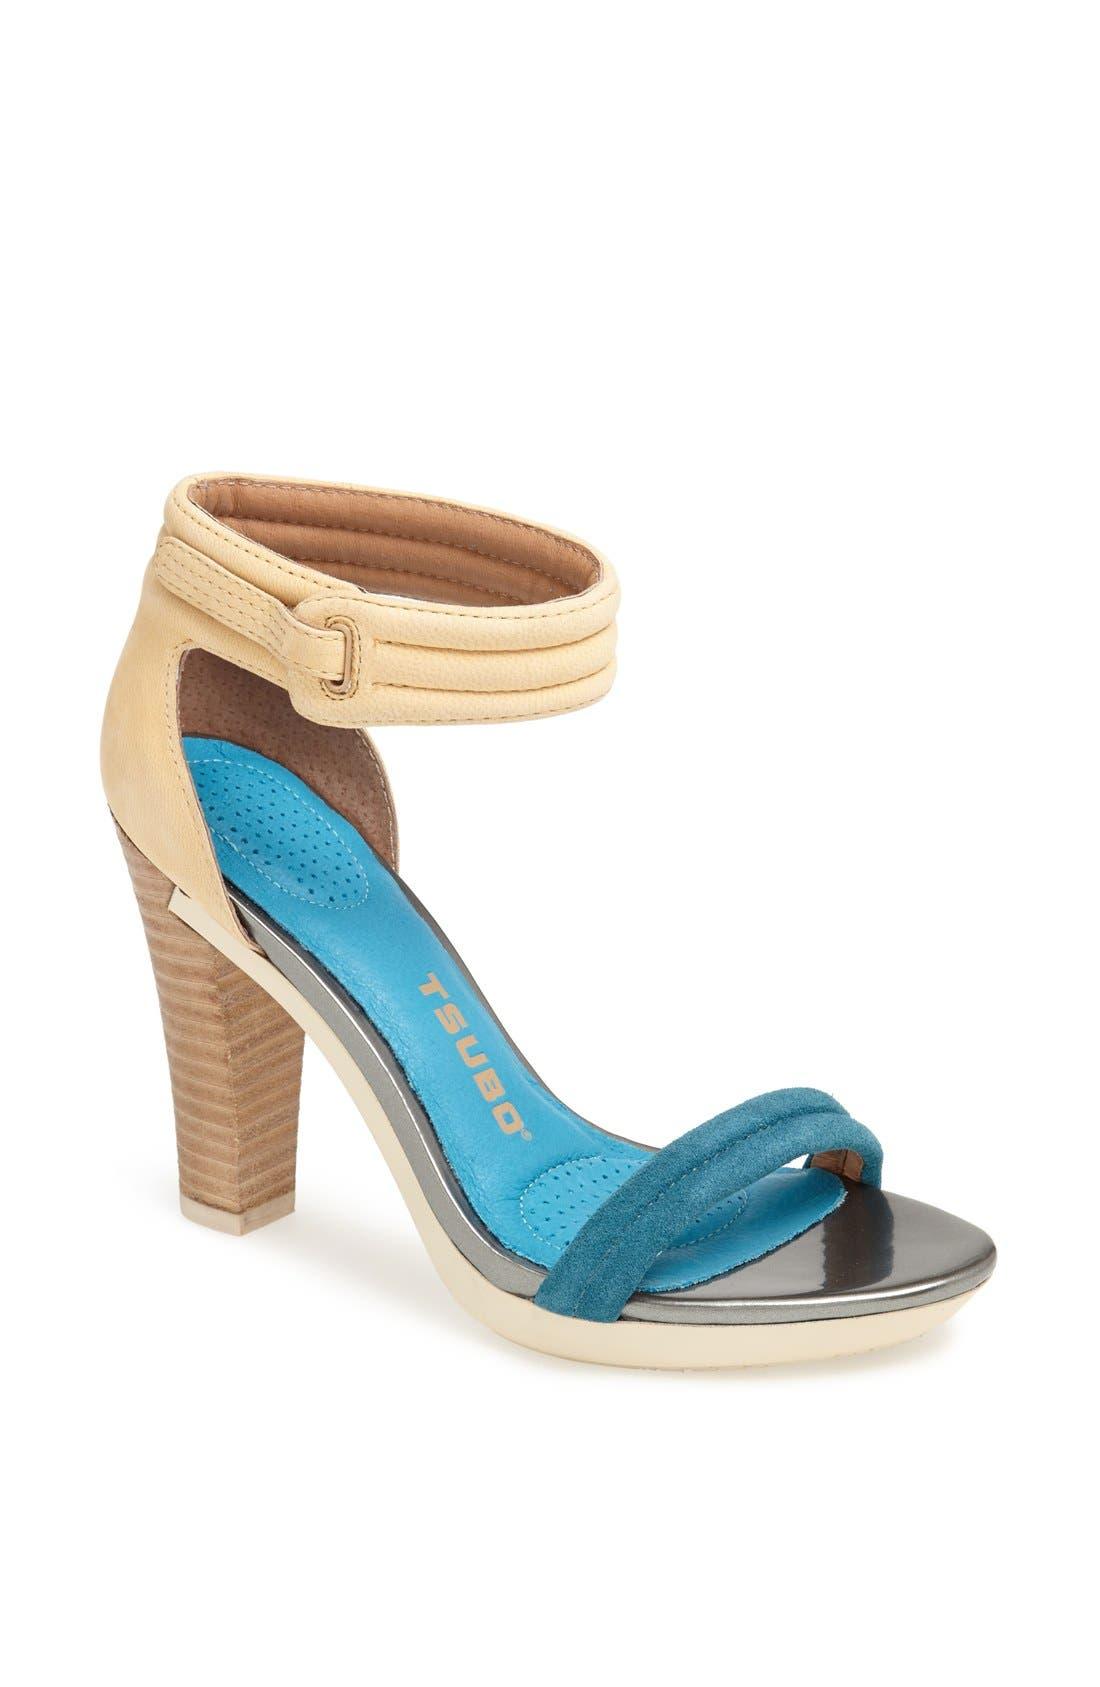 Alternate Image 1 Selected - Tsubo 'Triss' Sandal